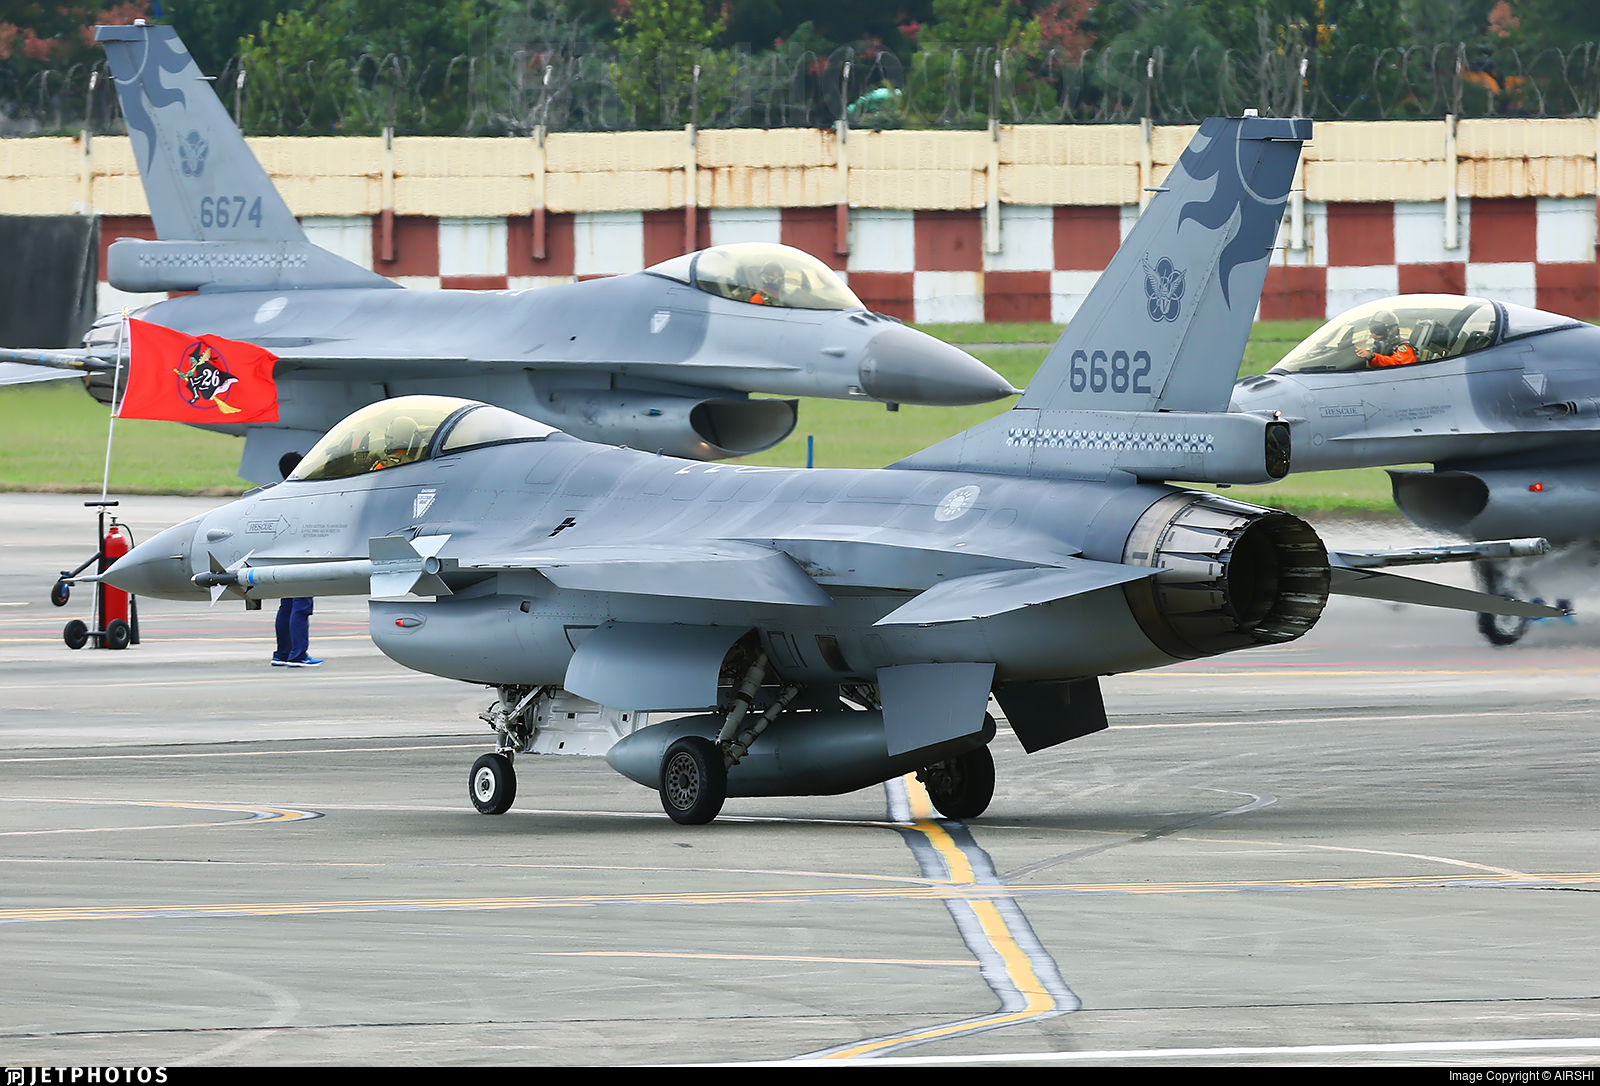 6682 - General Dynamics F-16AM Fighting Falcon - Taiwan - Air Force